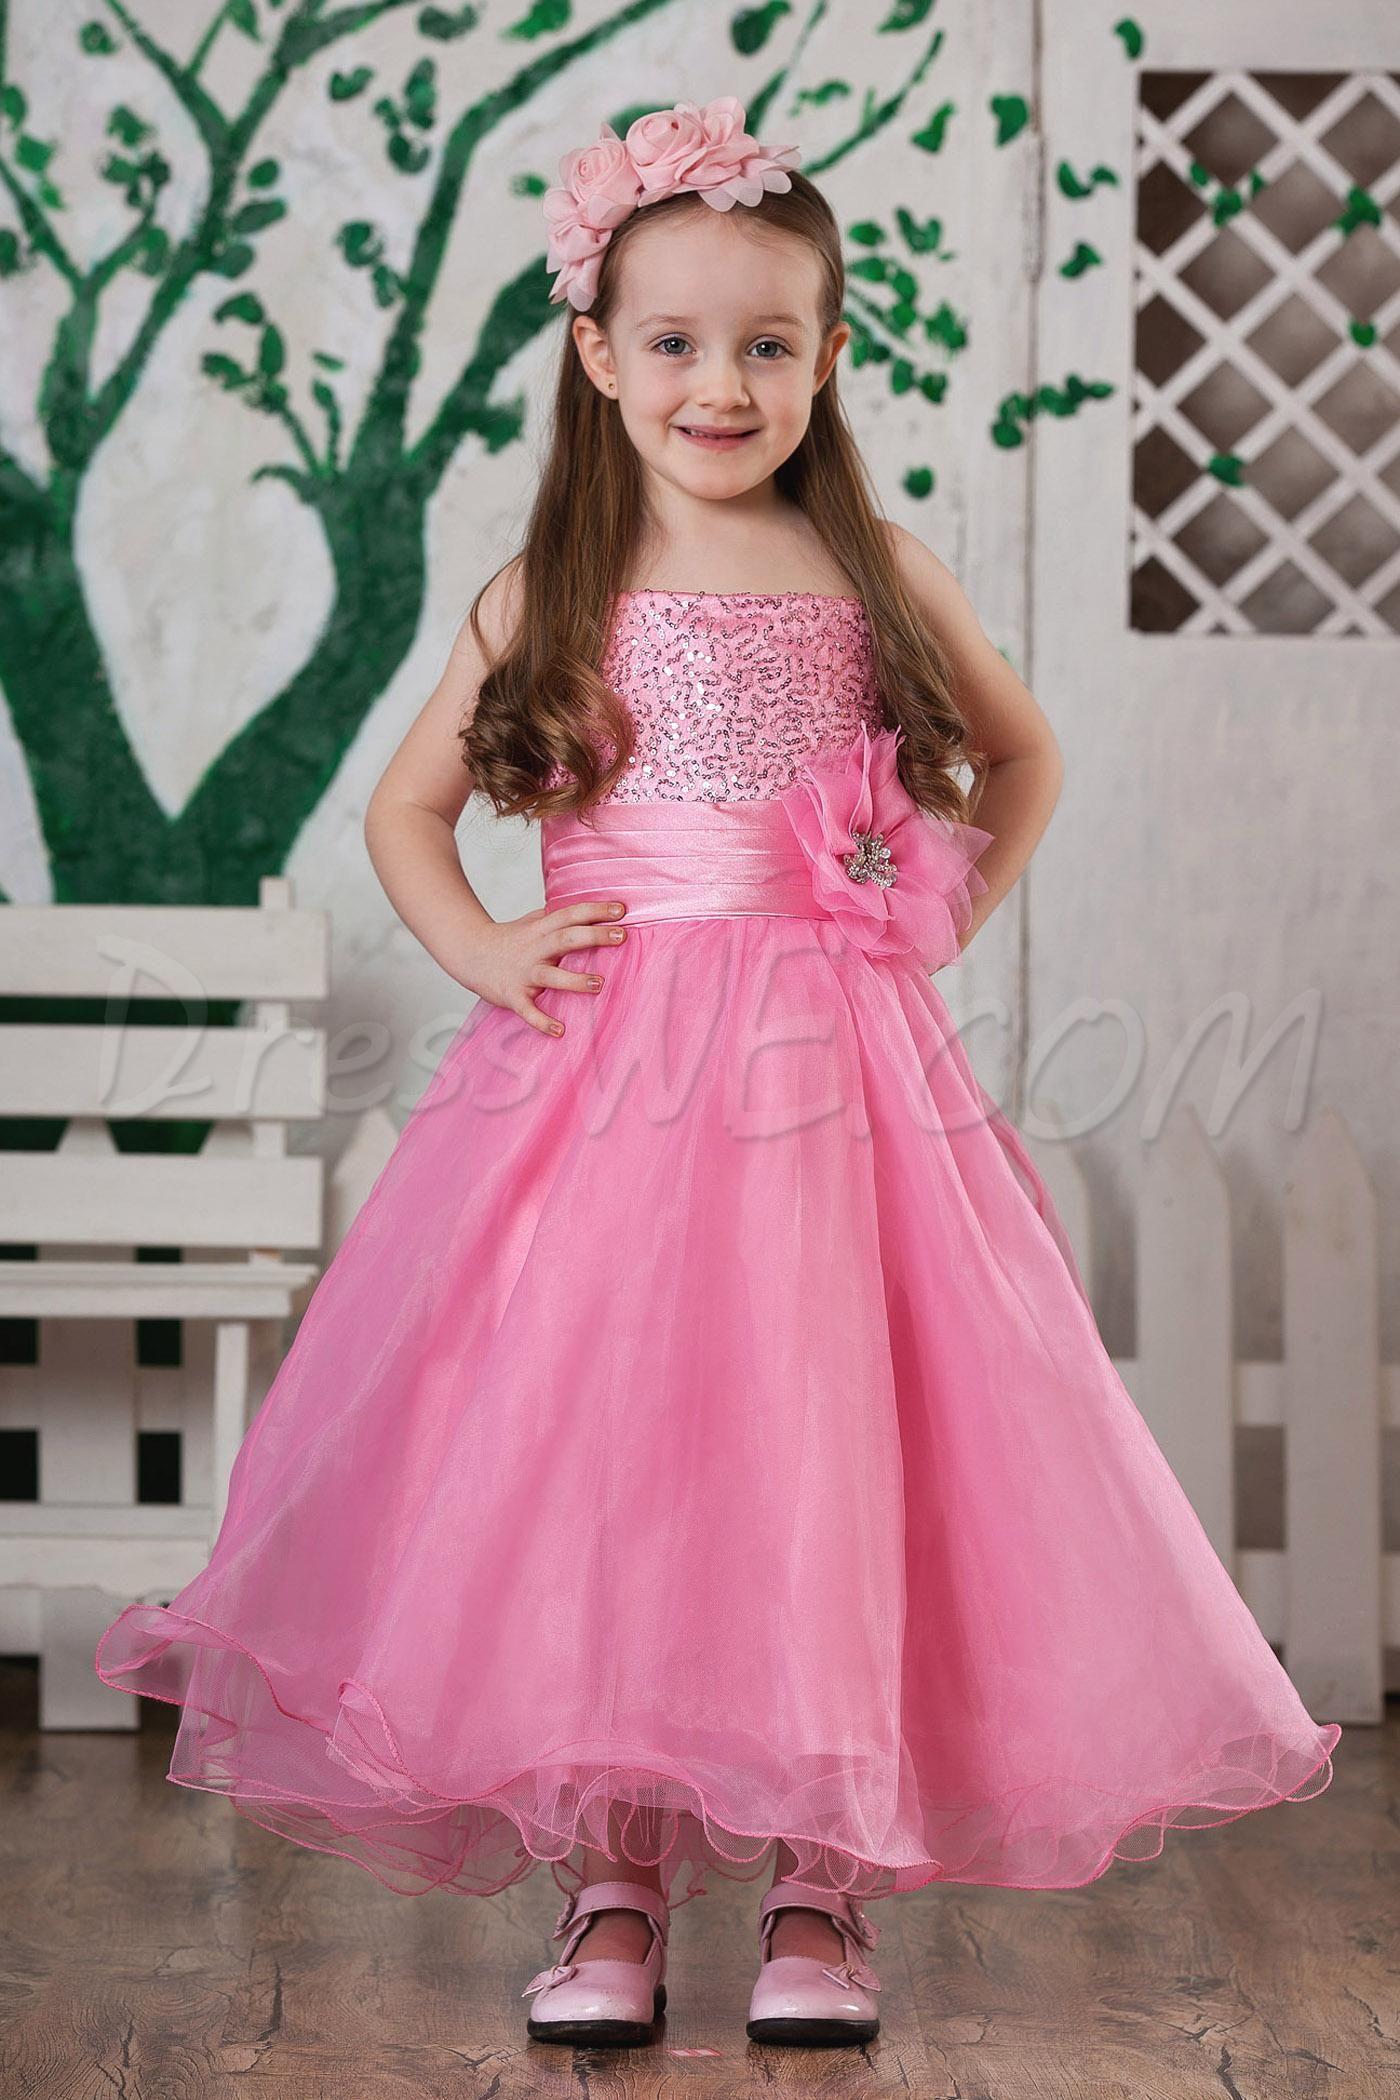 d92465e8ecd2  85.79 Dresswe.com SUPPLIES Amazing Straps Ball Gown Knee-length ...